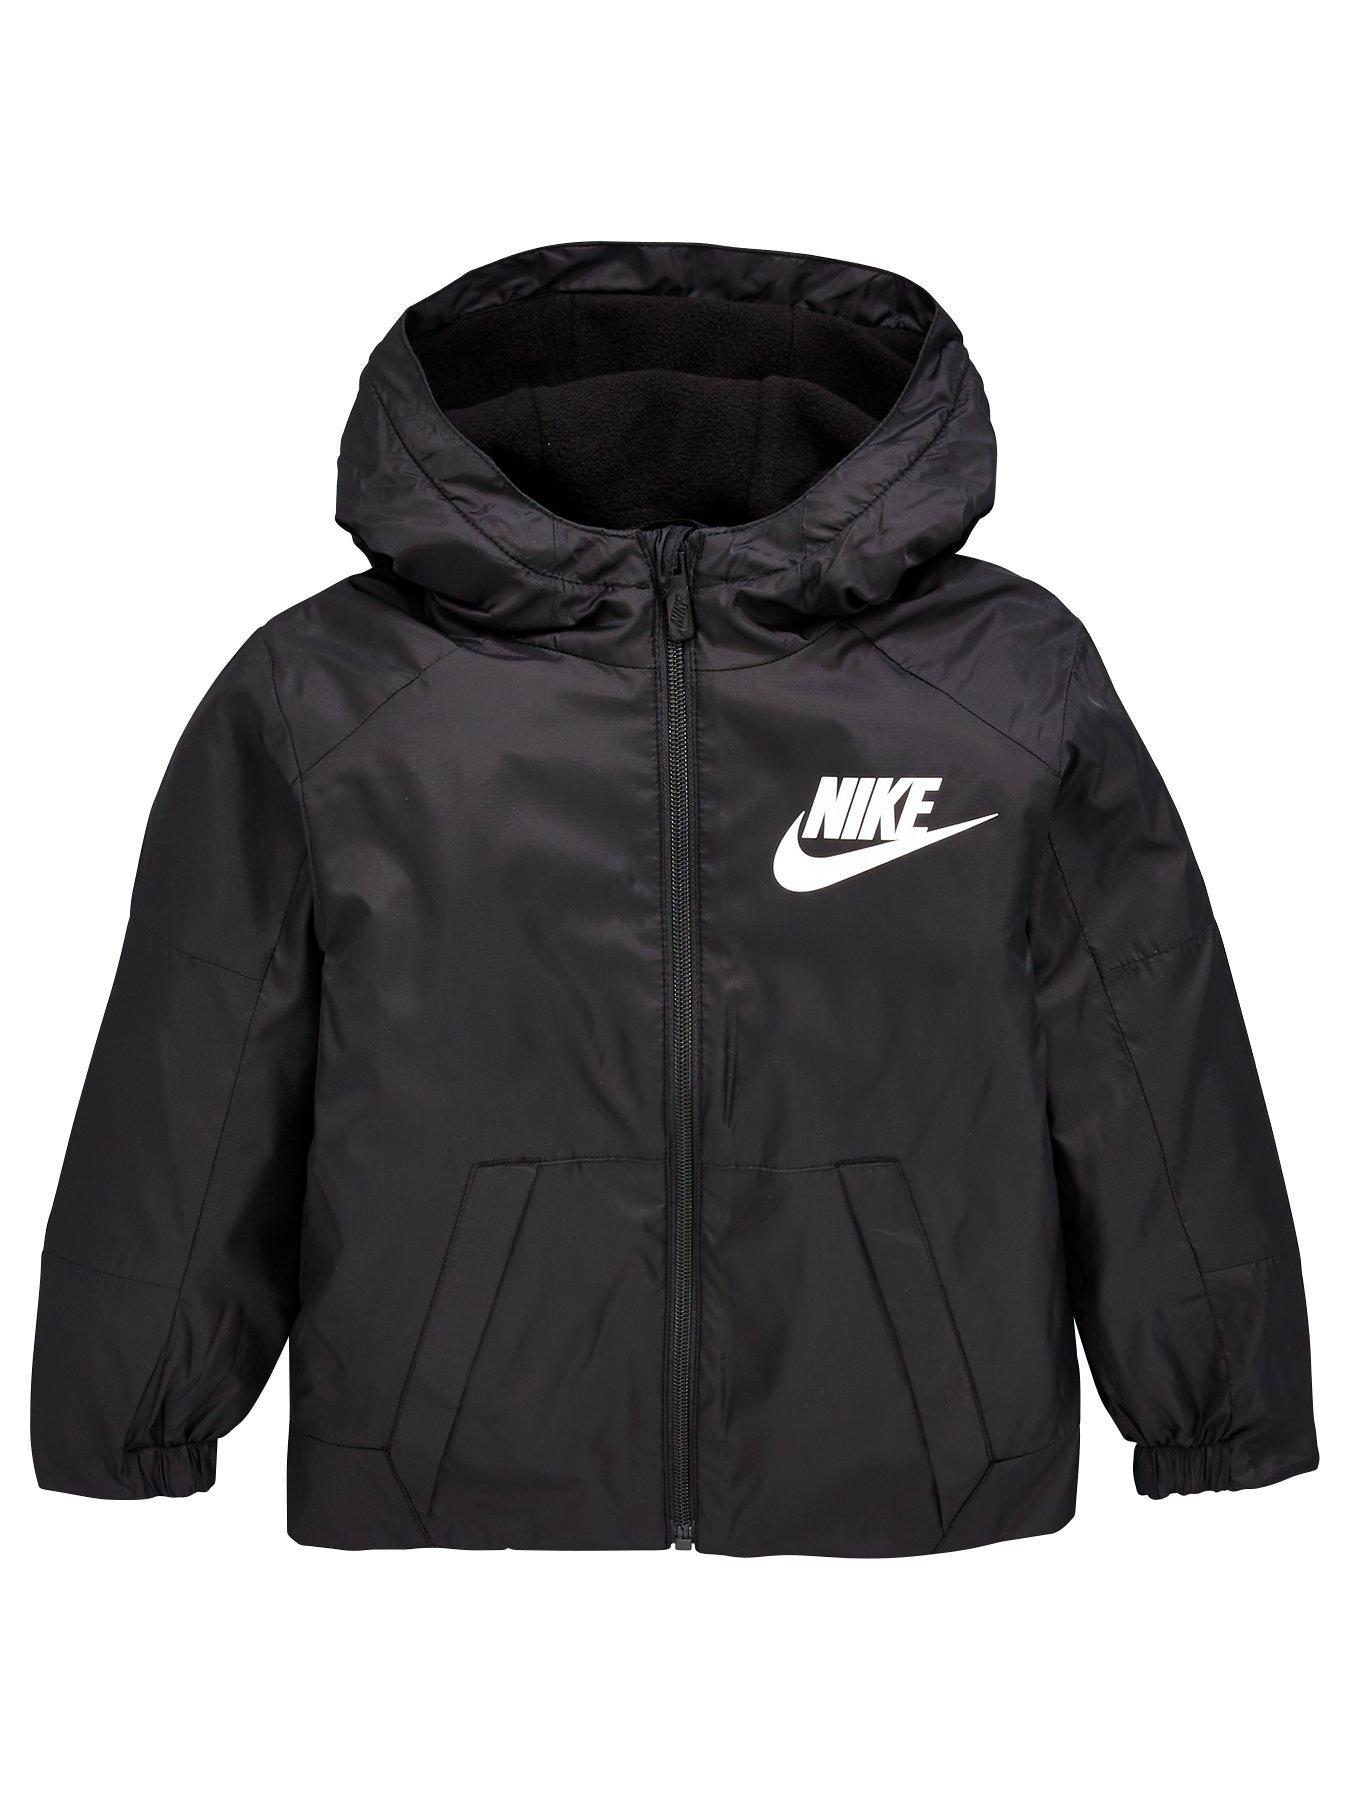 Coats \u0026 jackets | Boys clothes | Child